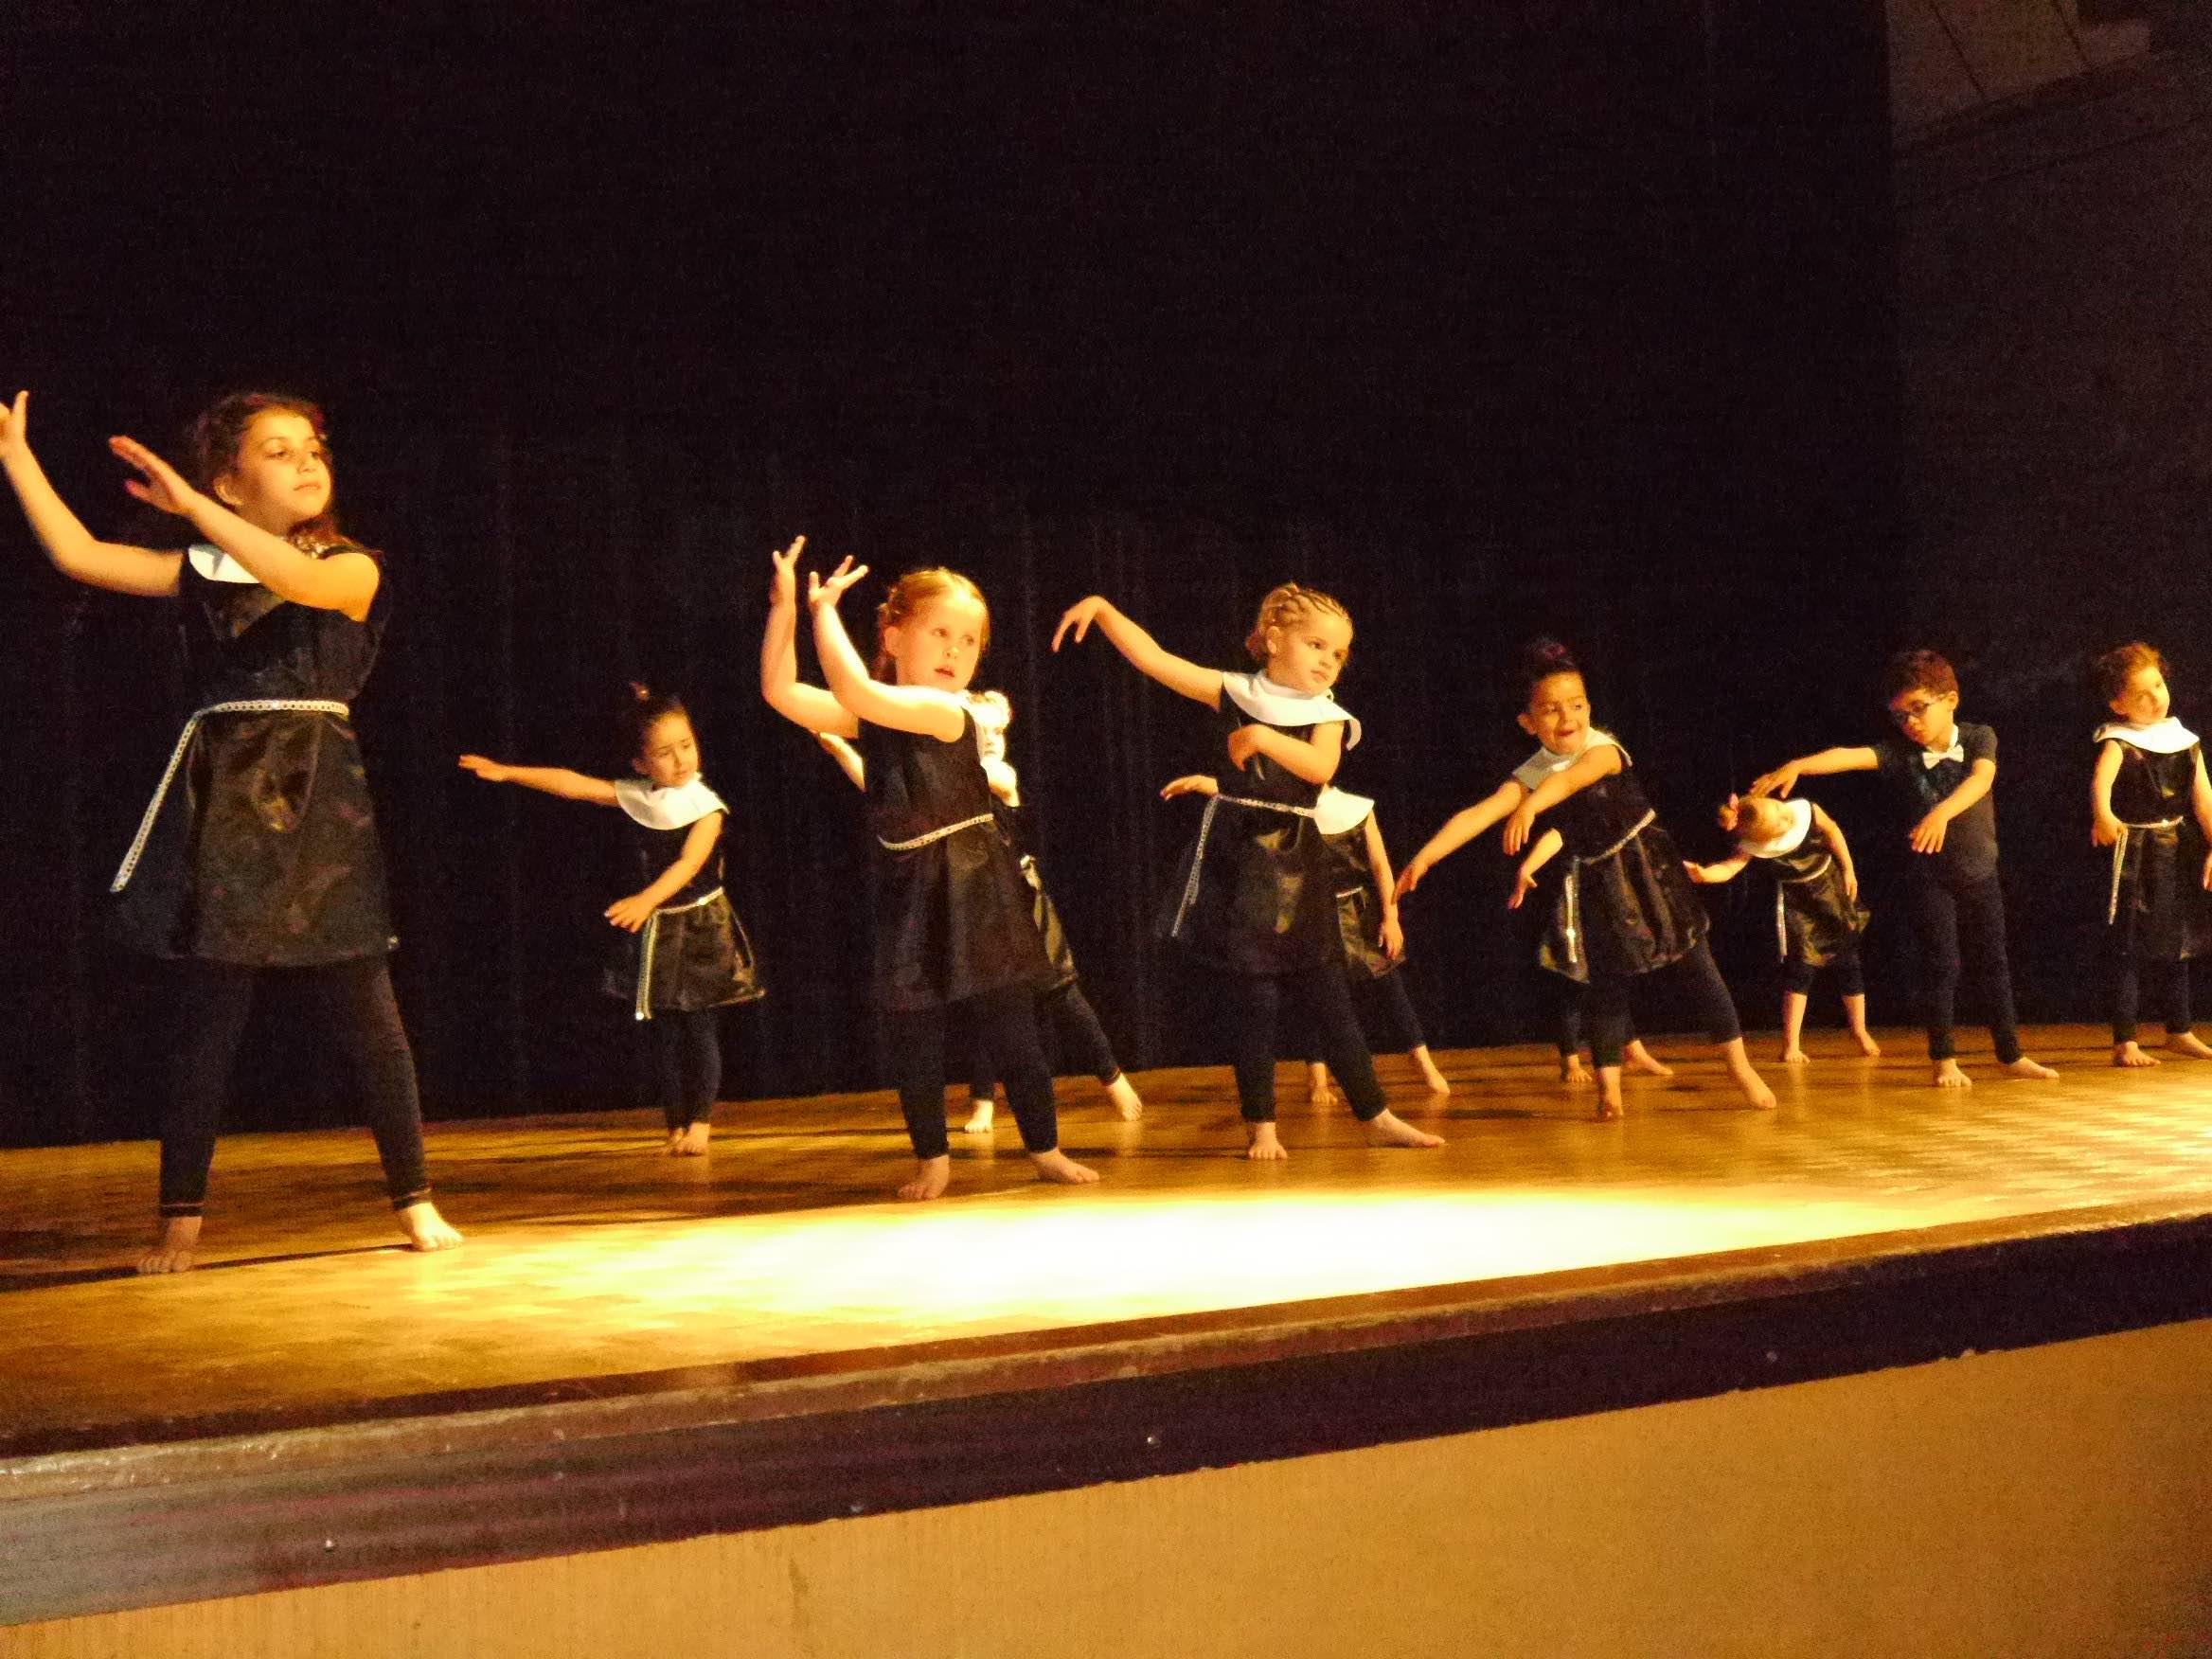 gala-danse-rythmique-fli-pompey 1 (13)